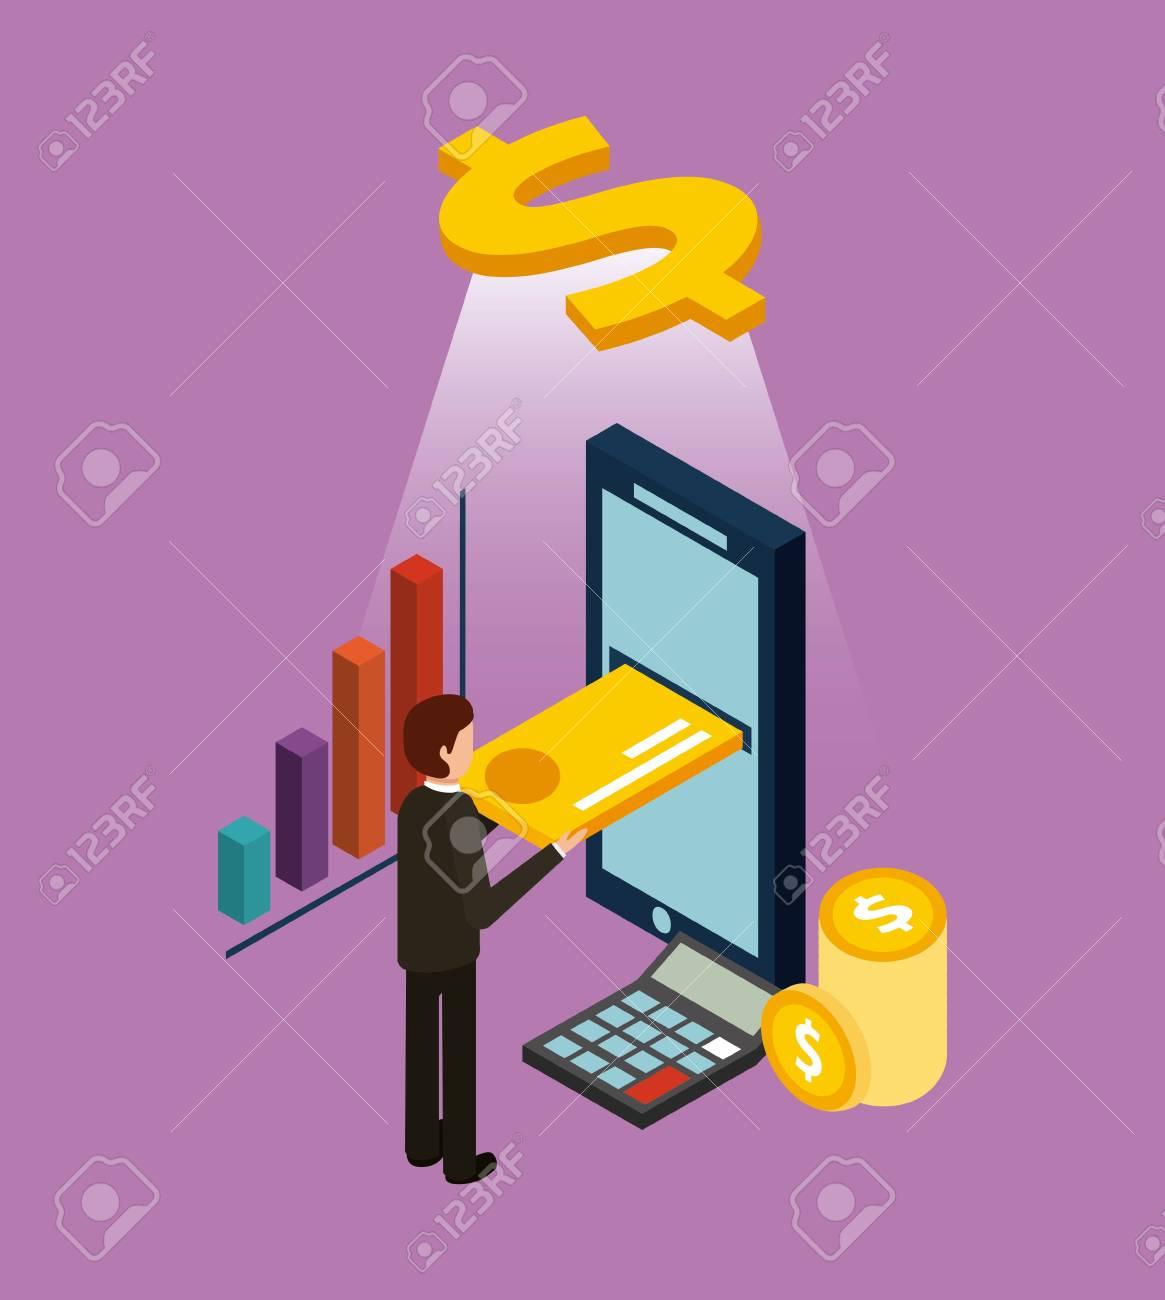 businessman inserting credit card on mobile ecommerce digital isometric vector illustration - 91444279